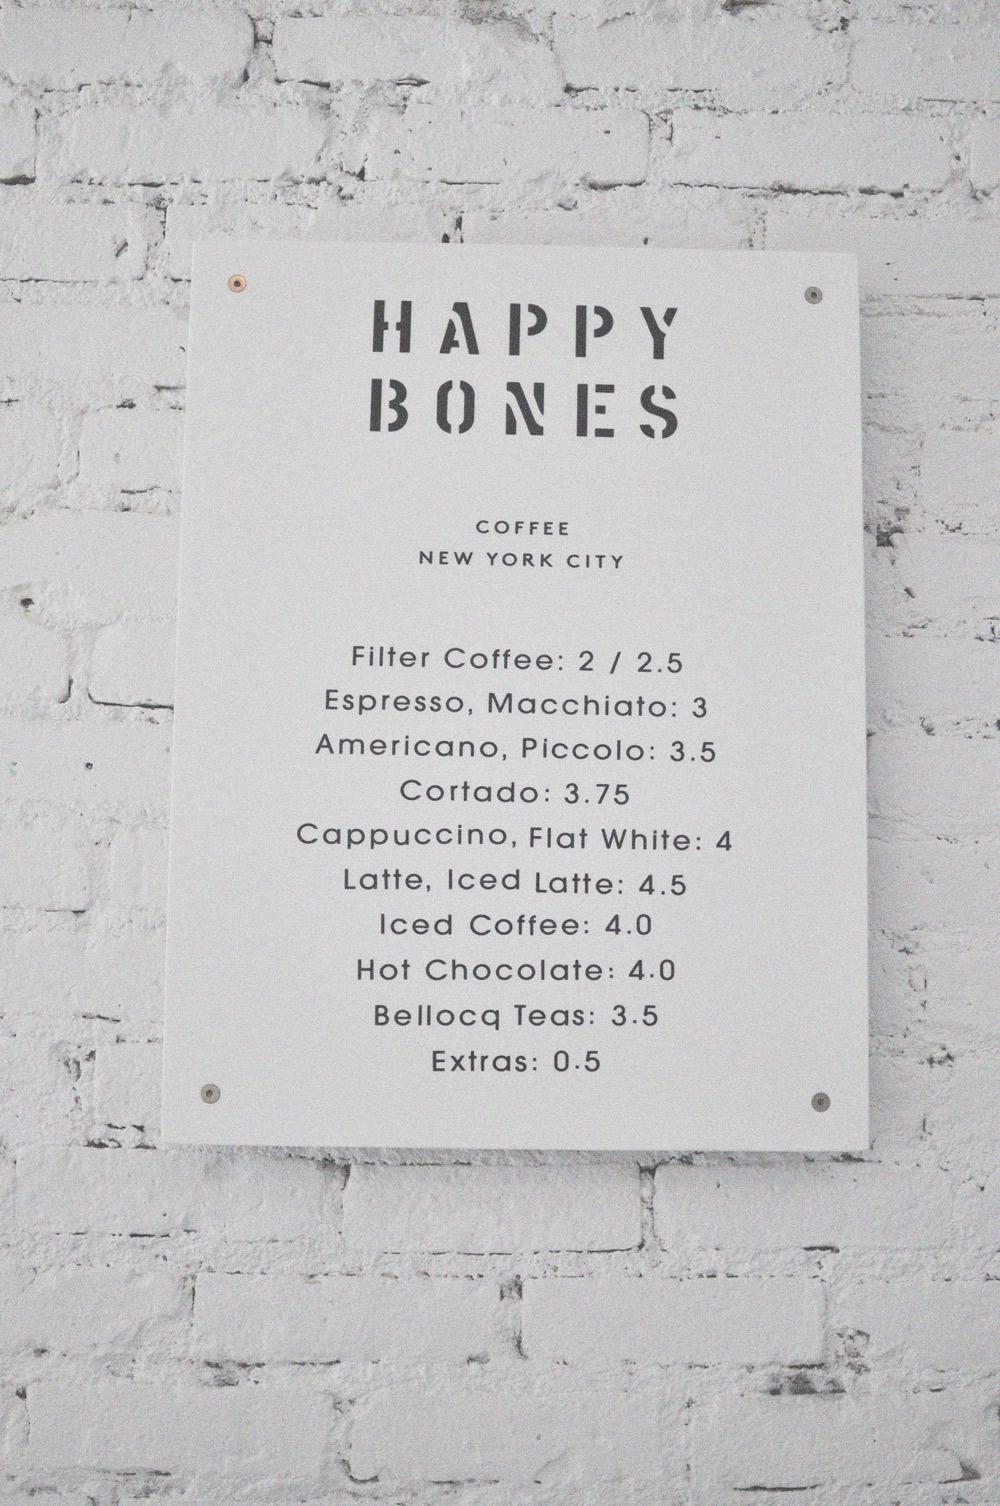 Happy-Bones-3.jpg